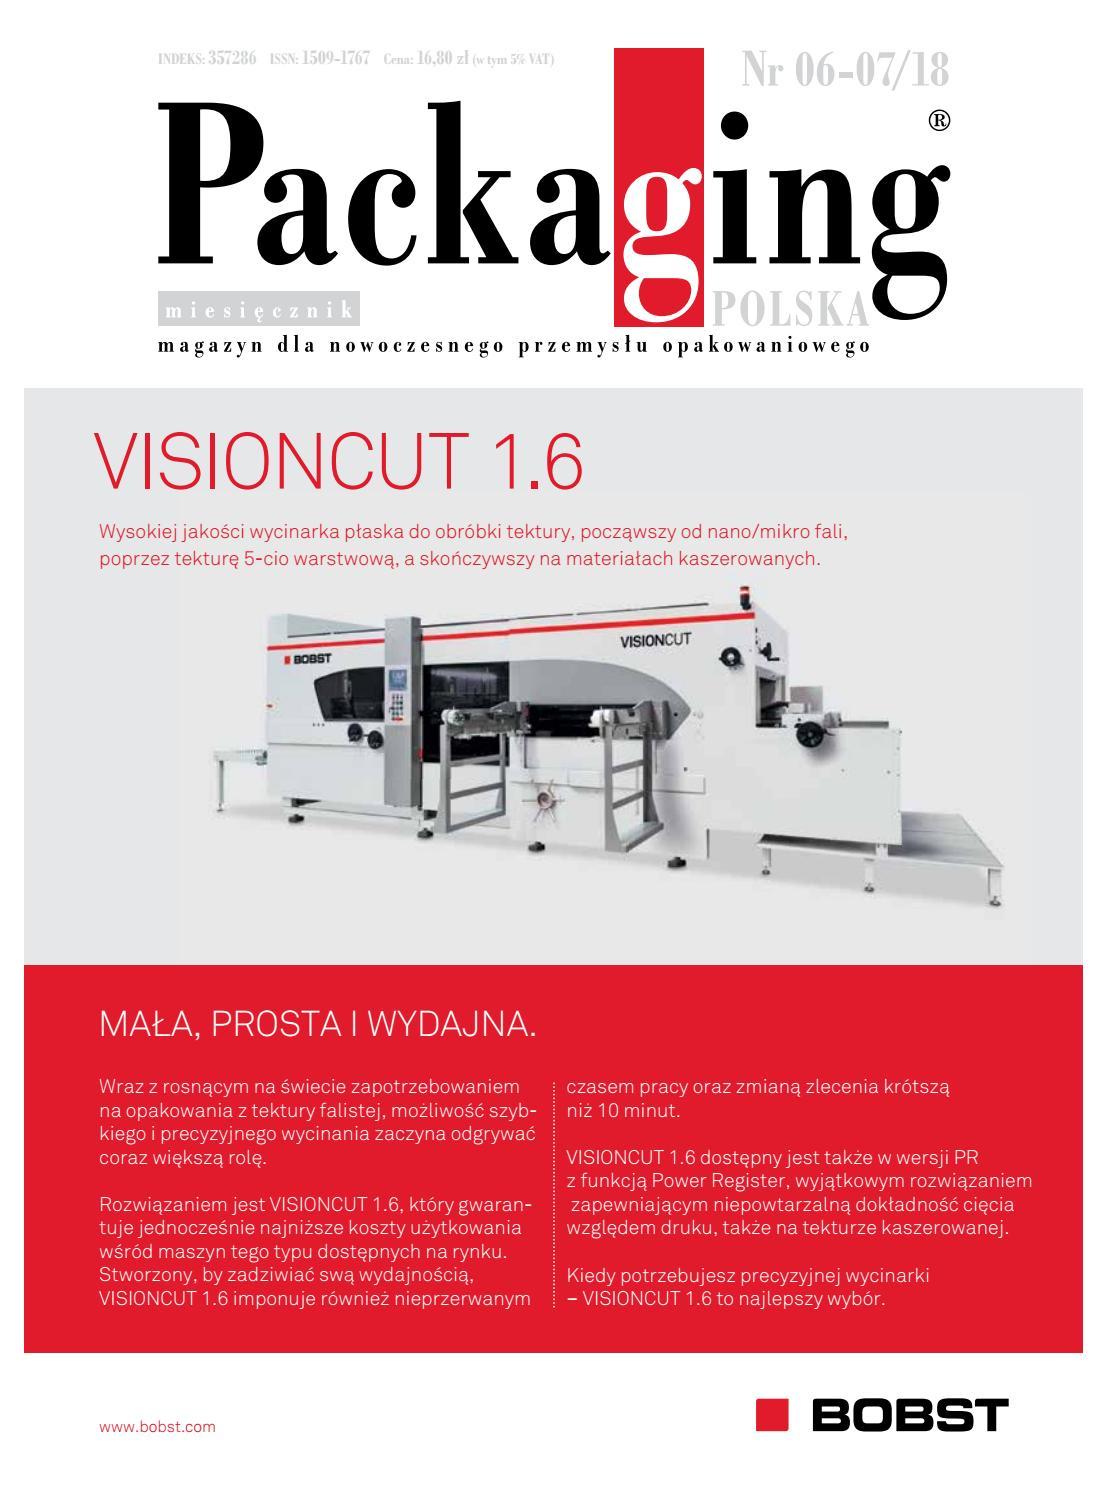 9a5f782f770e7 Packaging Polska 06-07/2018 by Redakcja EMG - issuu